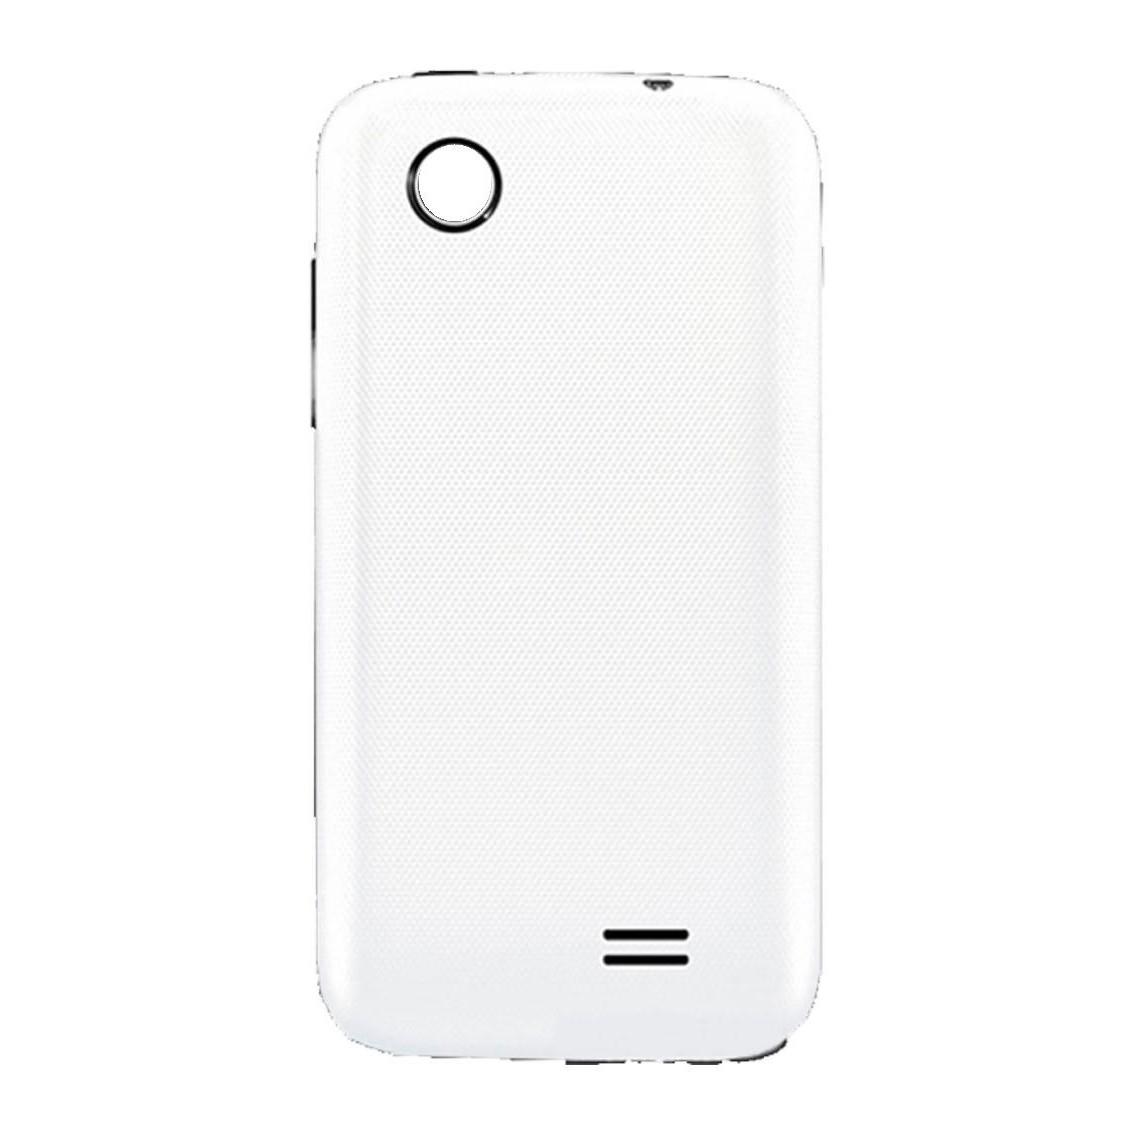 hot sale online 1efbe 3e309 Back Panel Cover for Lenovo A369i - White